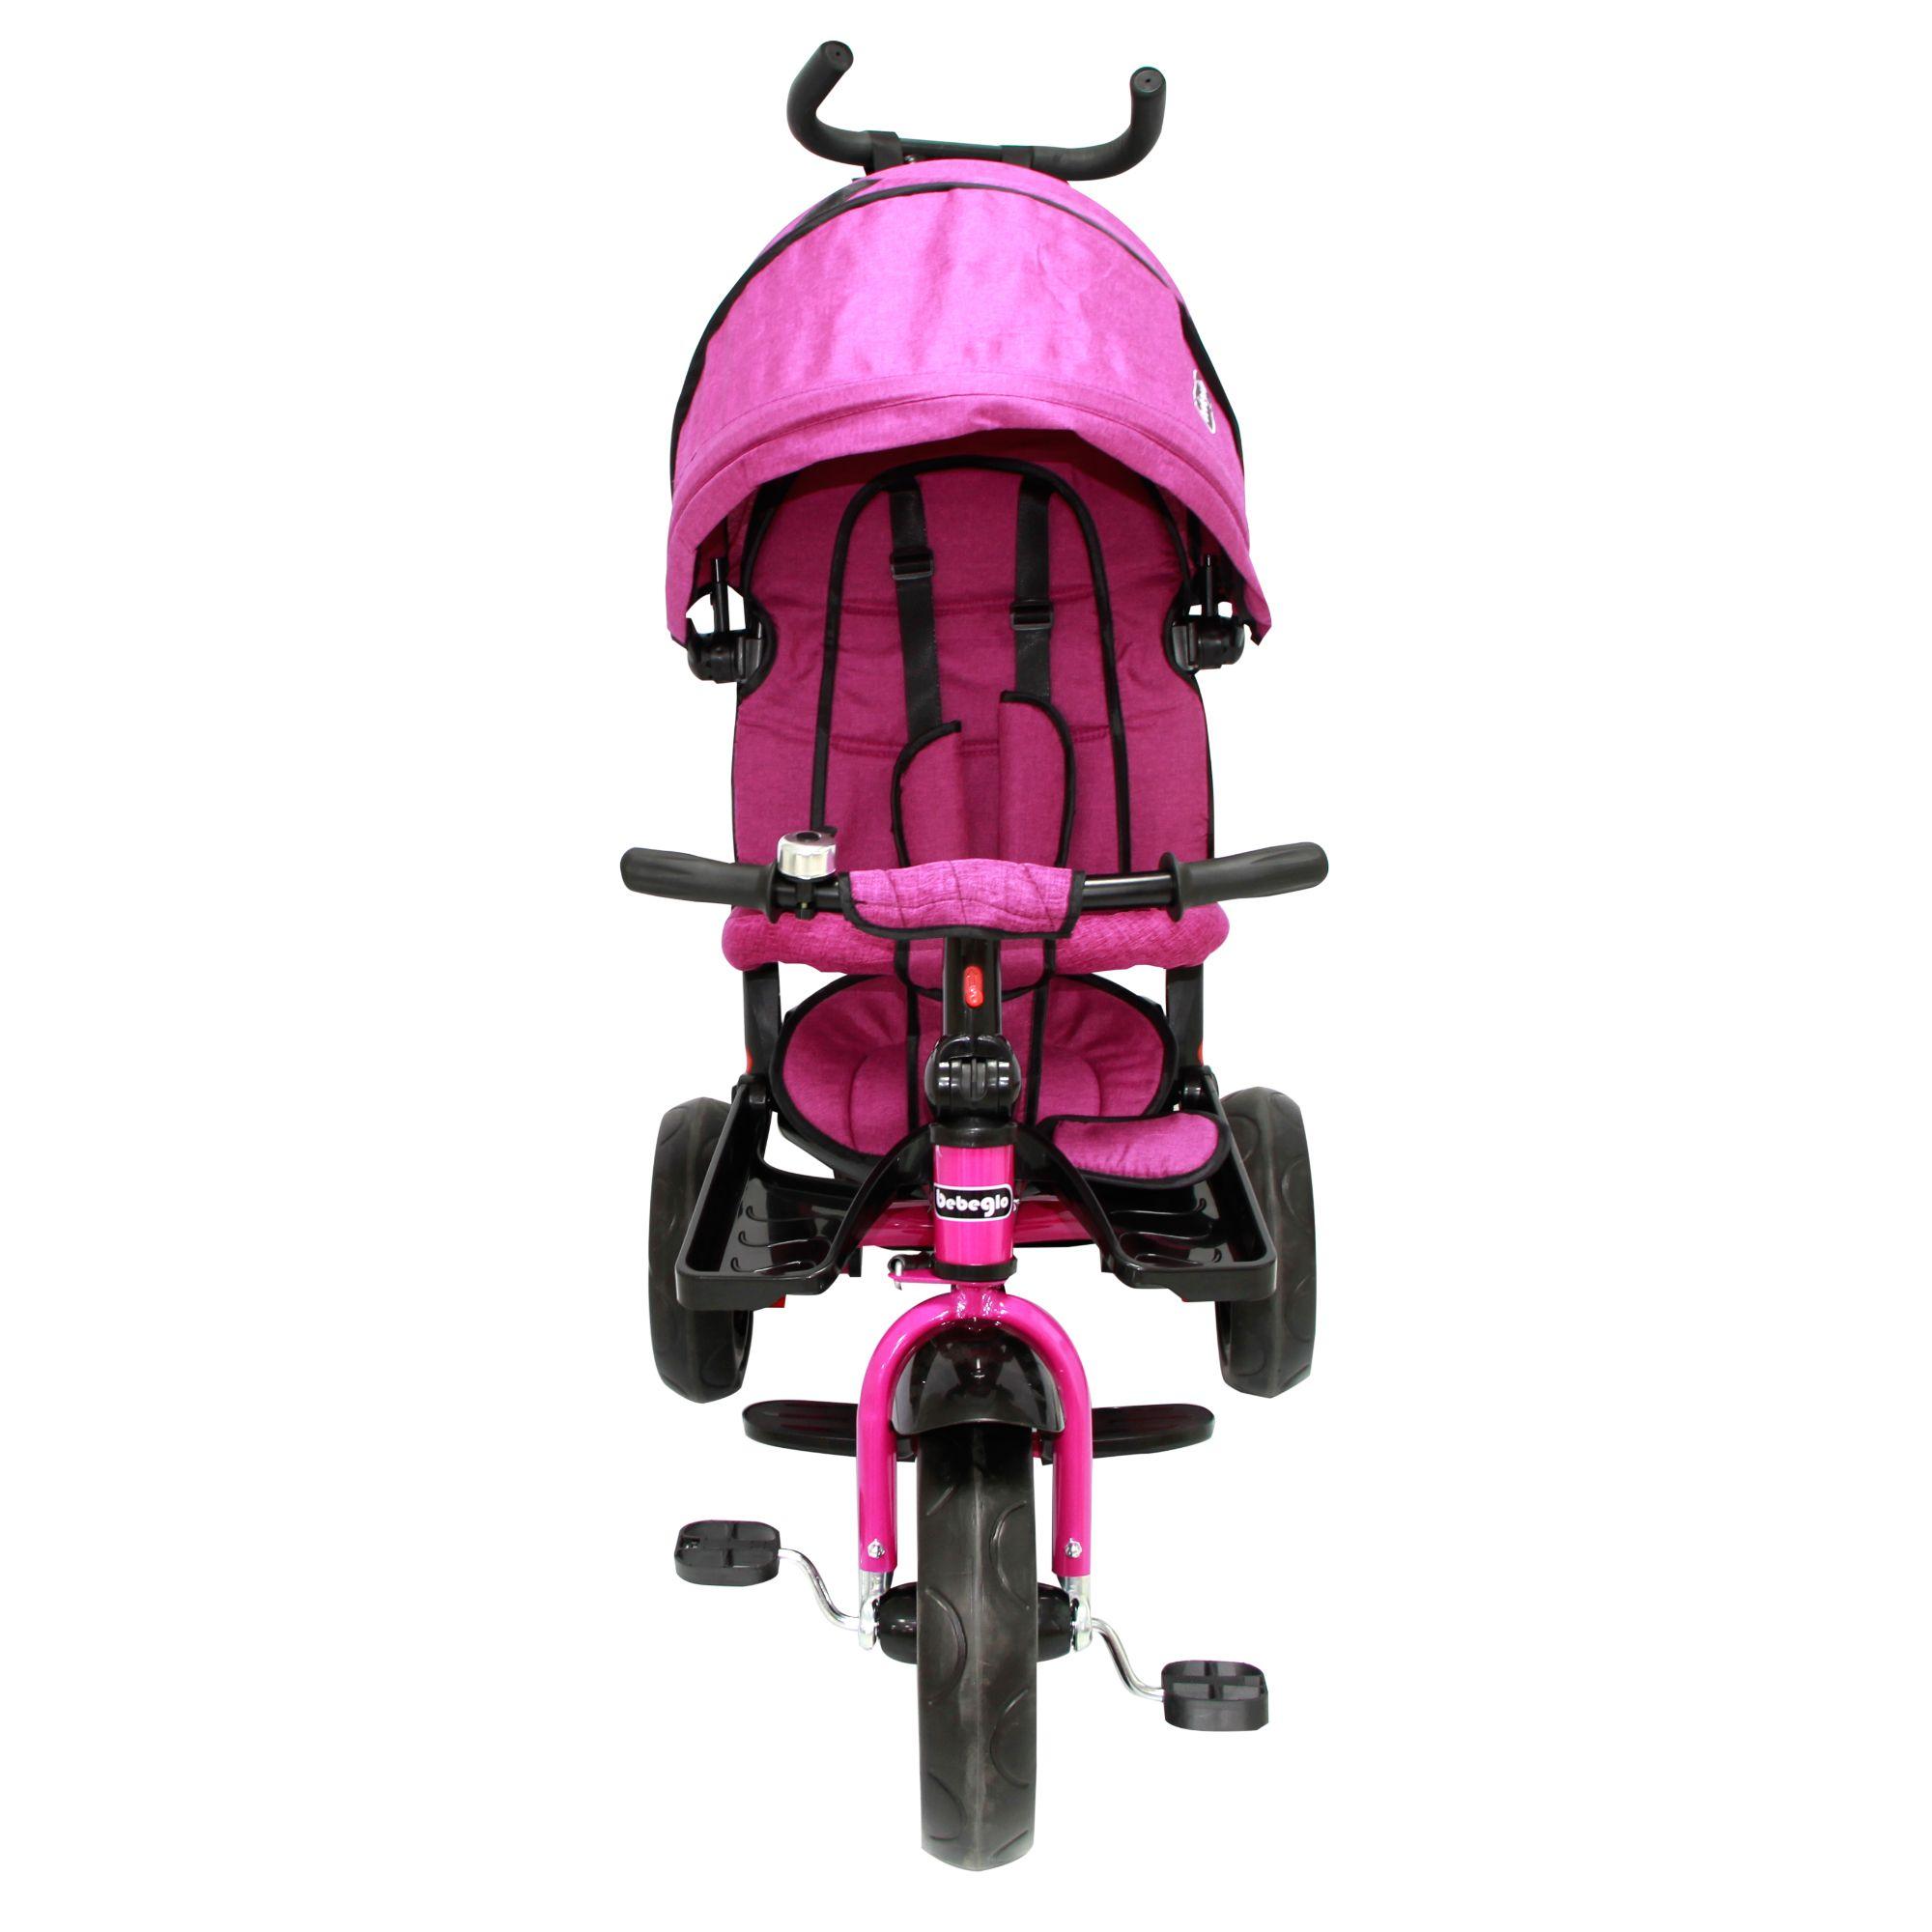 Triciclo Bebeglo Reversible One Click - Fucsia